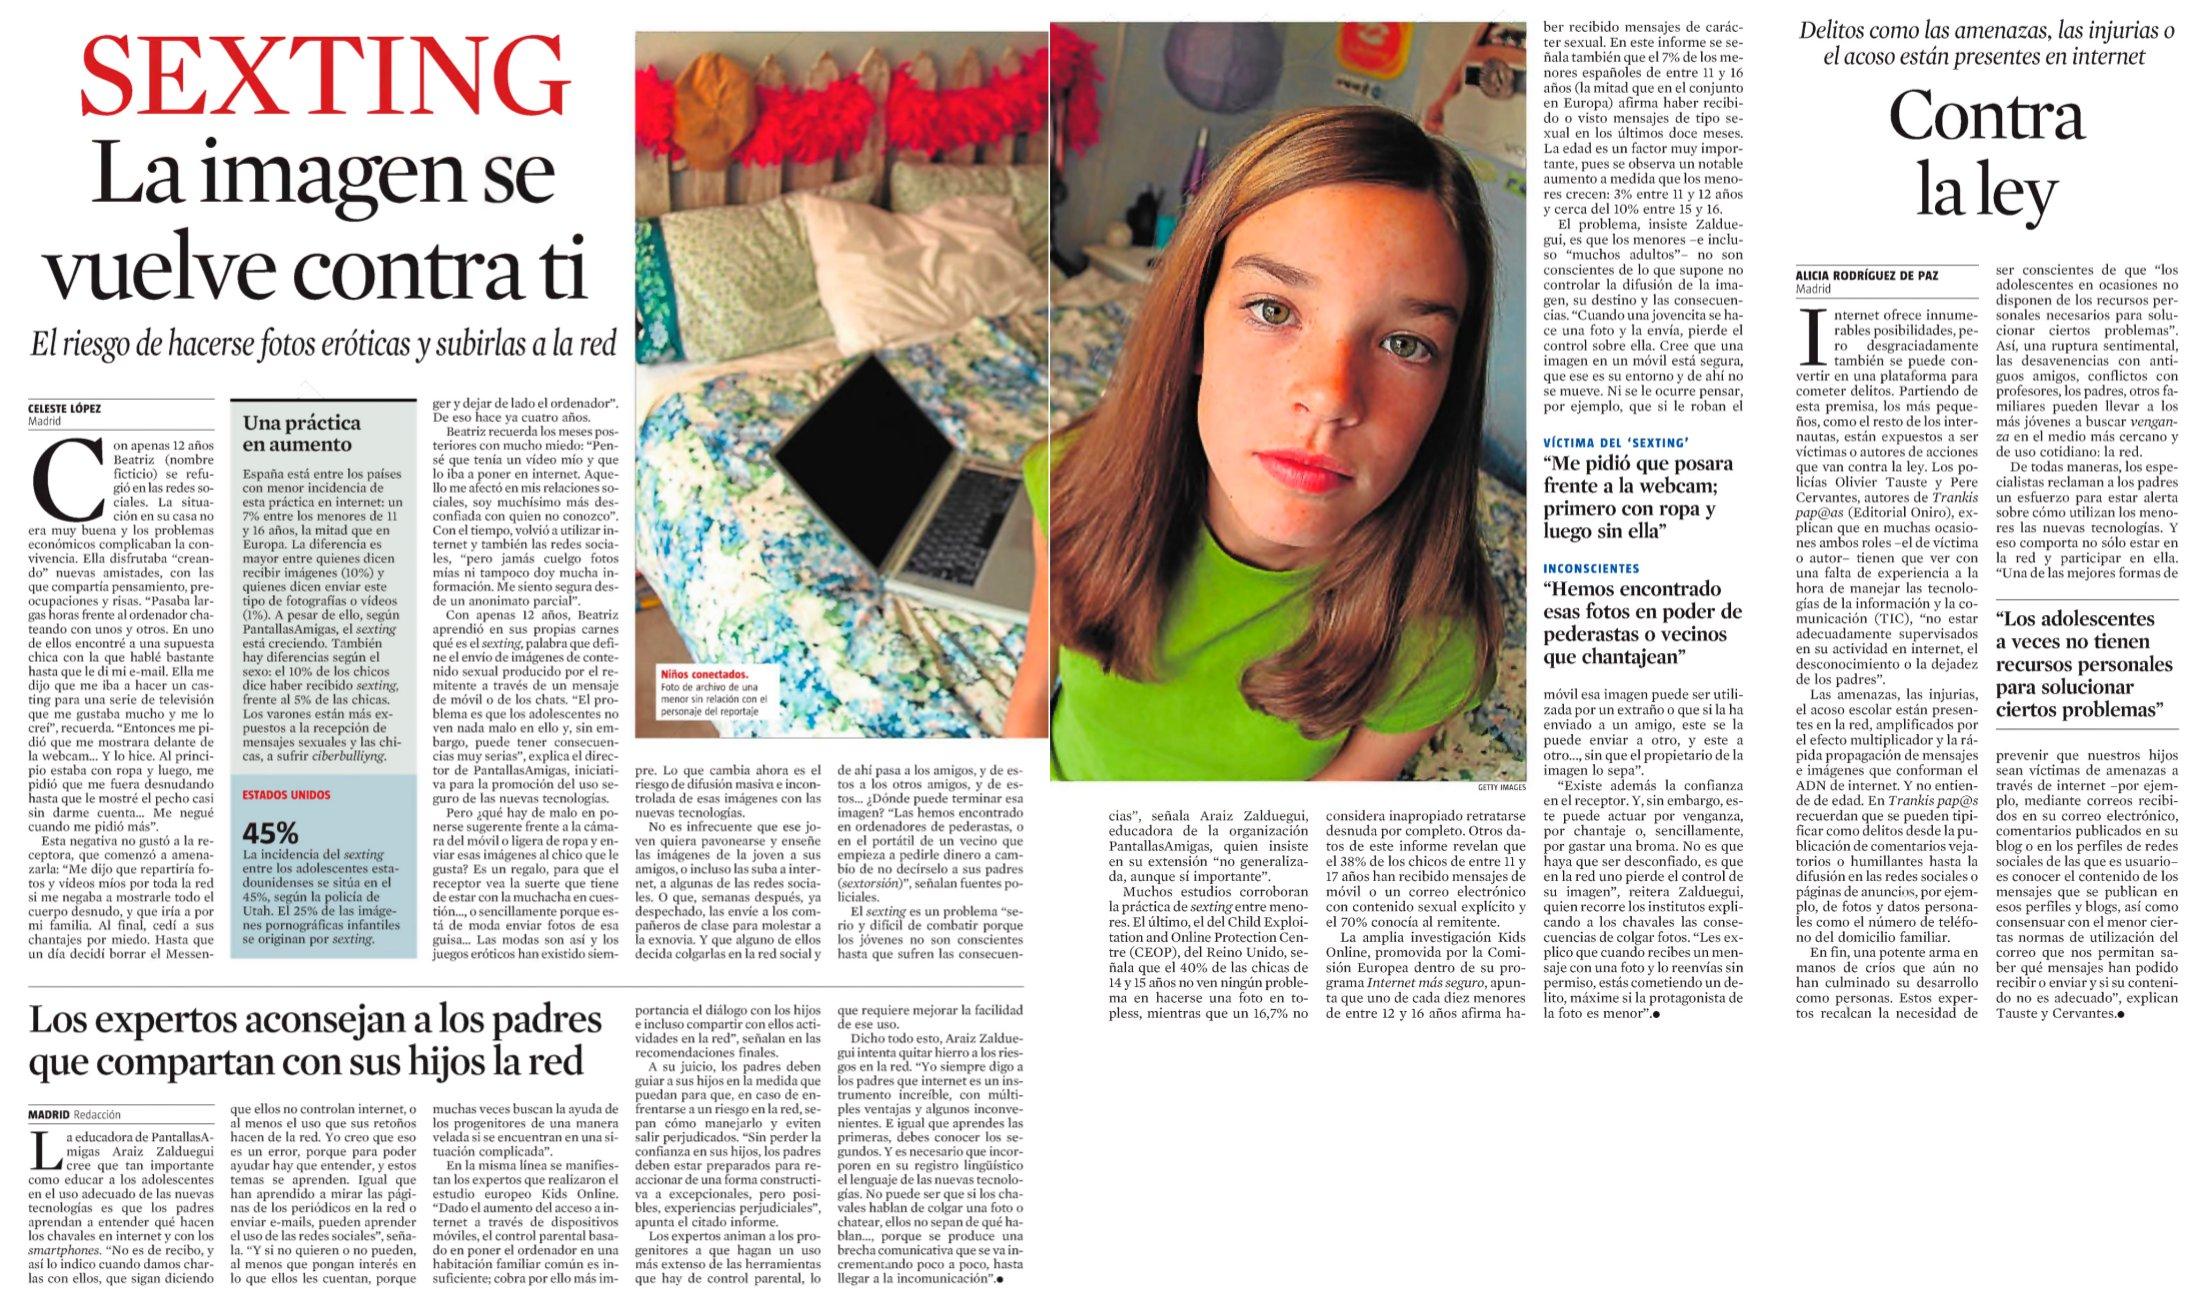 Sexting: la imagen se vuelve contra ti